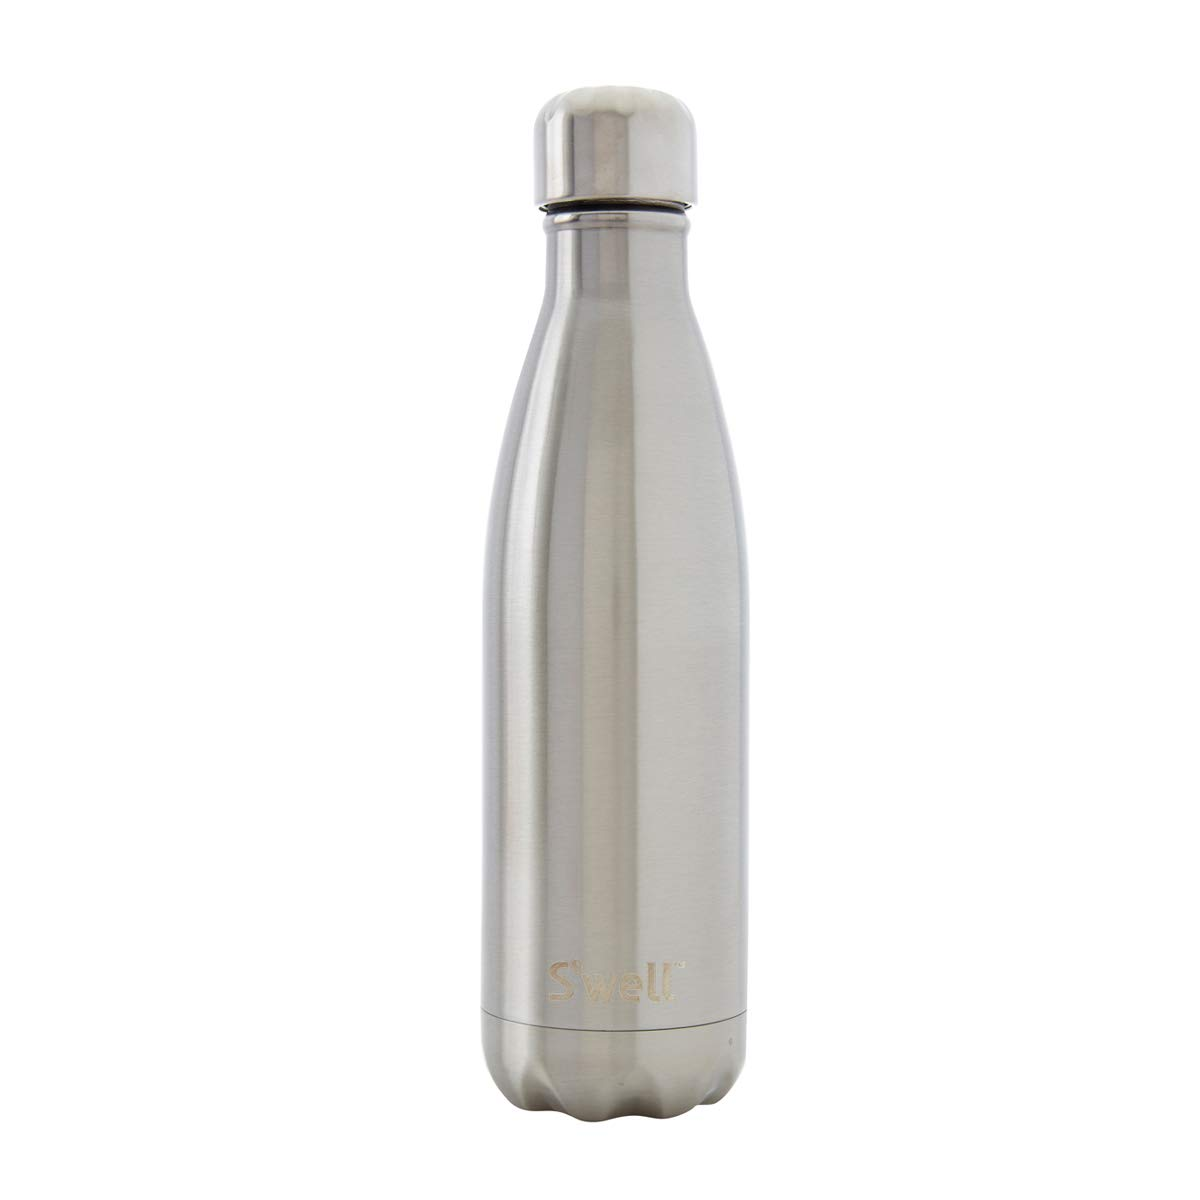 Top 10 Best Stainless Steel Water Bottle Reviews in 2020 9